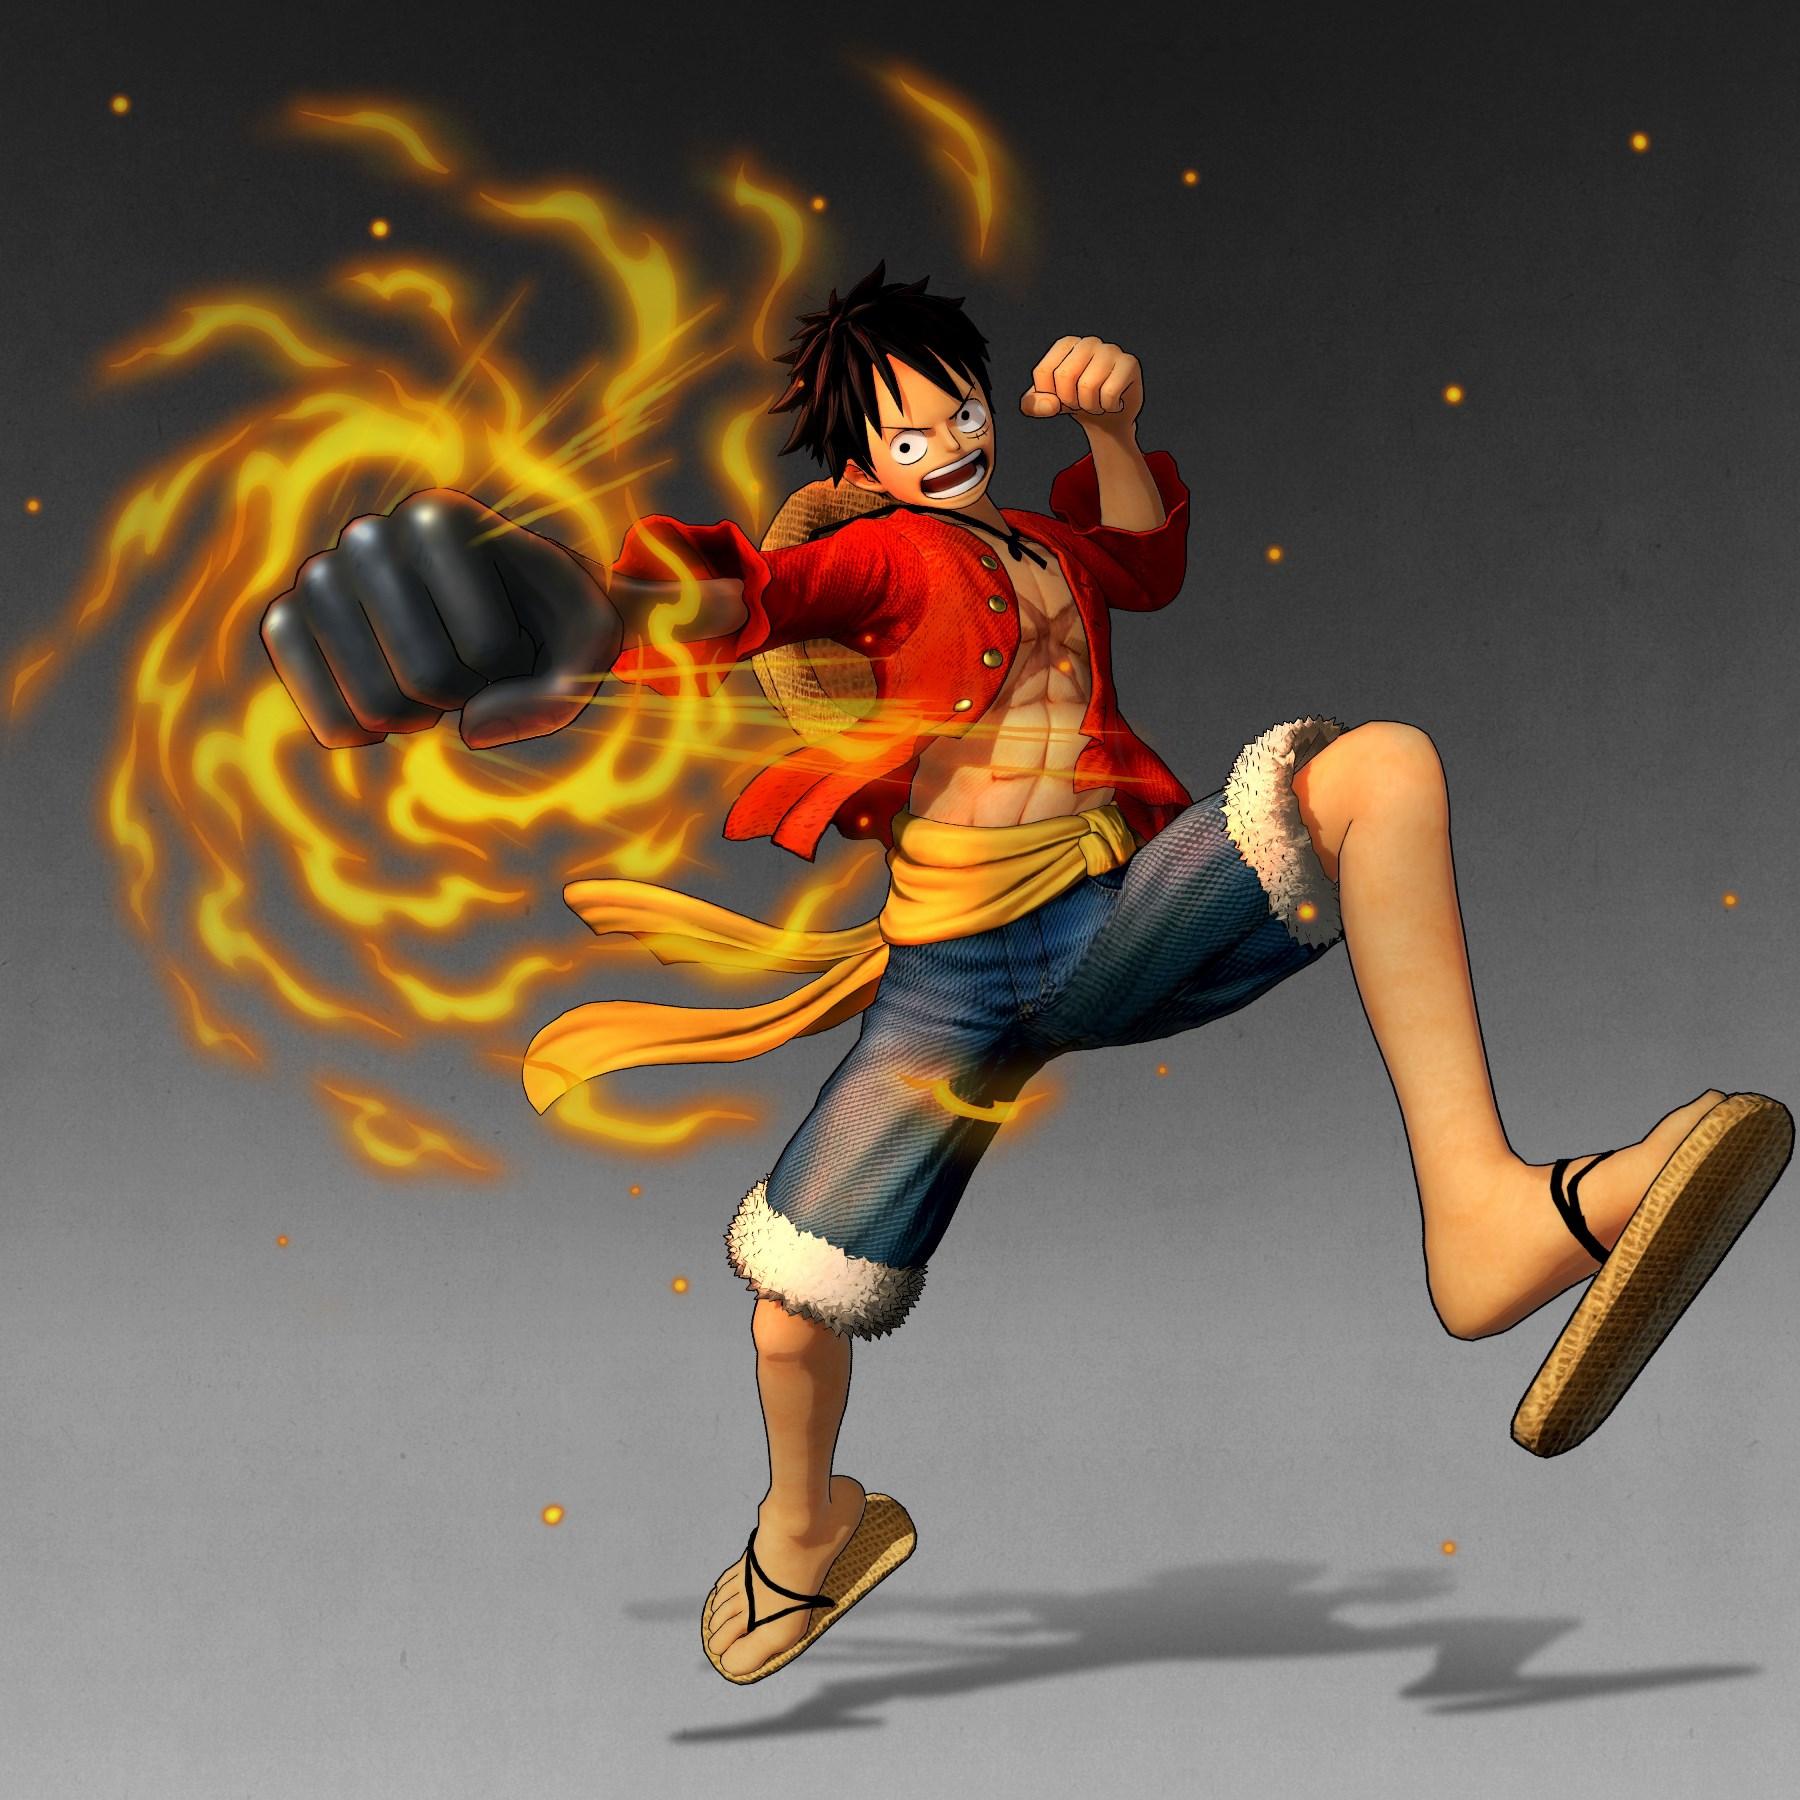 One Piece: Pirate Warriors 4 screenshots and art ...